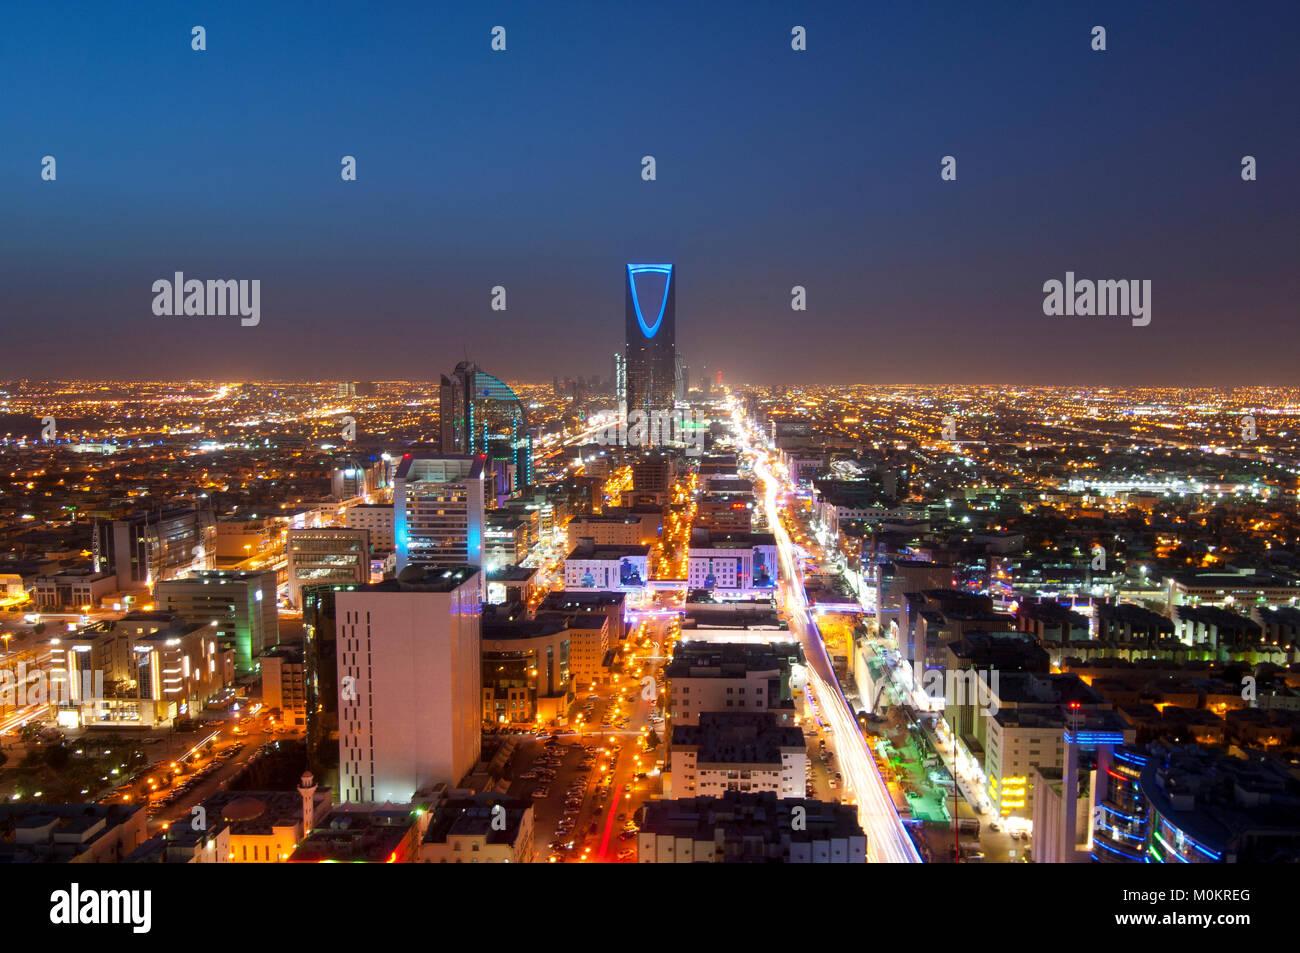 Riyadh skyline at night #1 Photo Stock